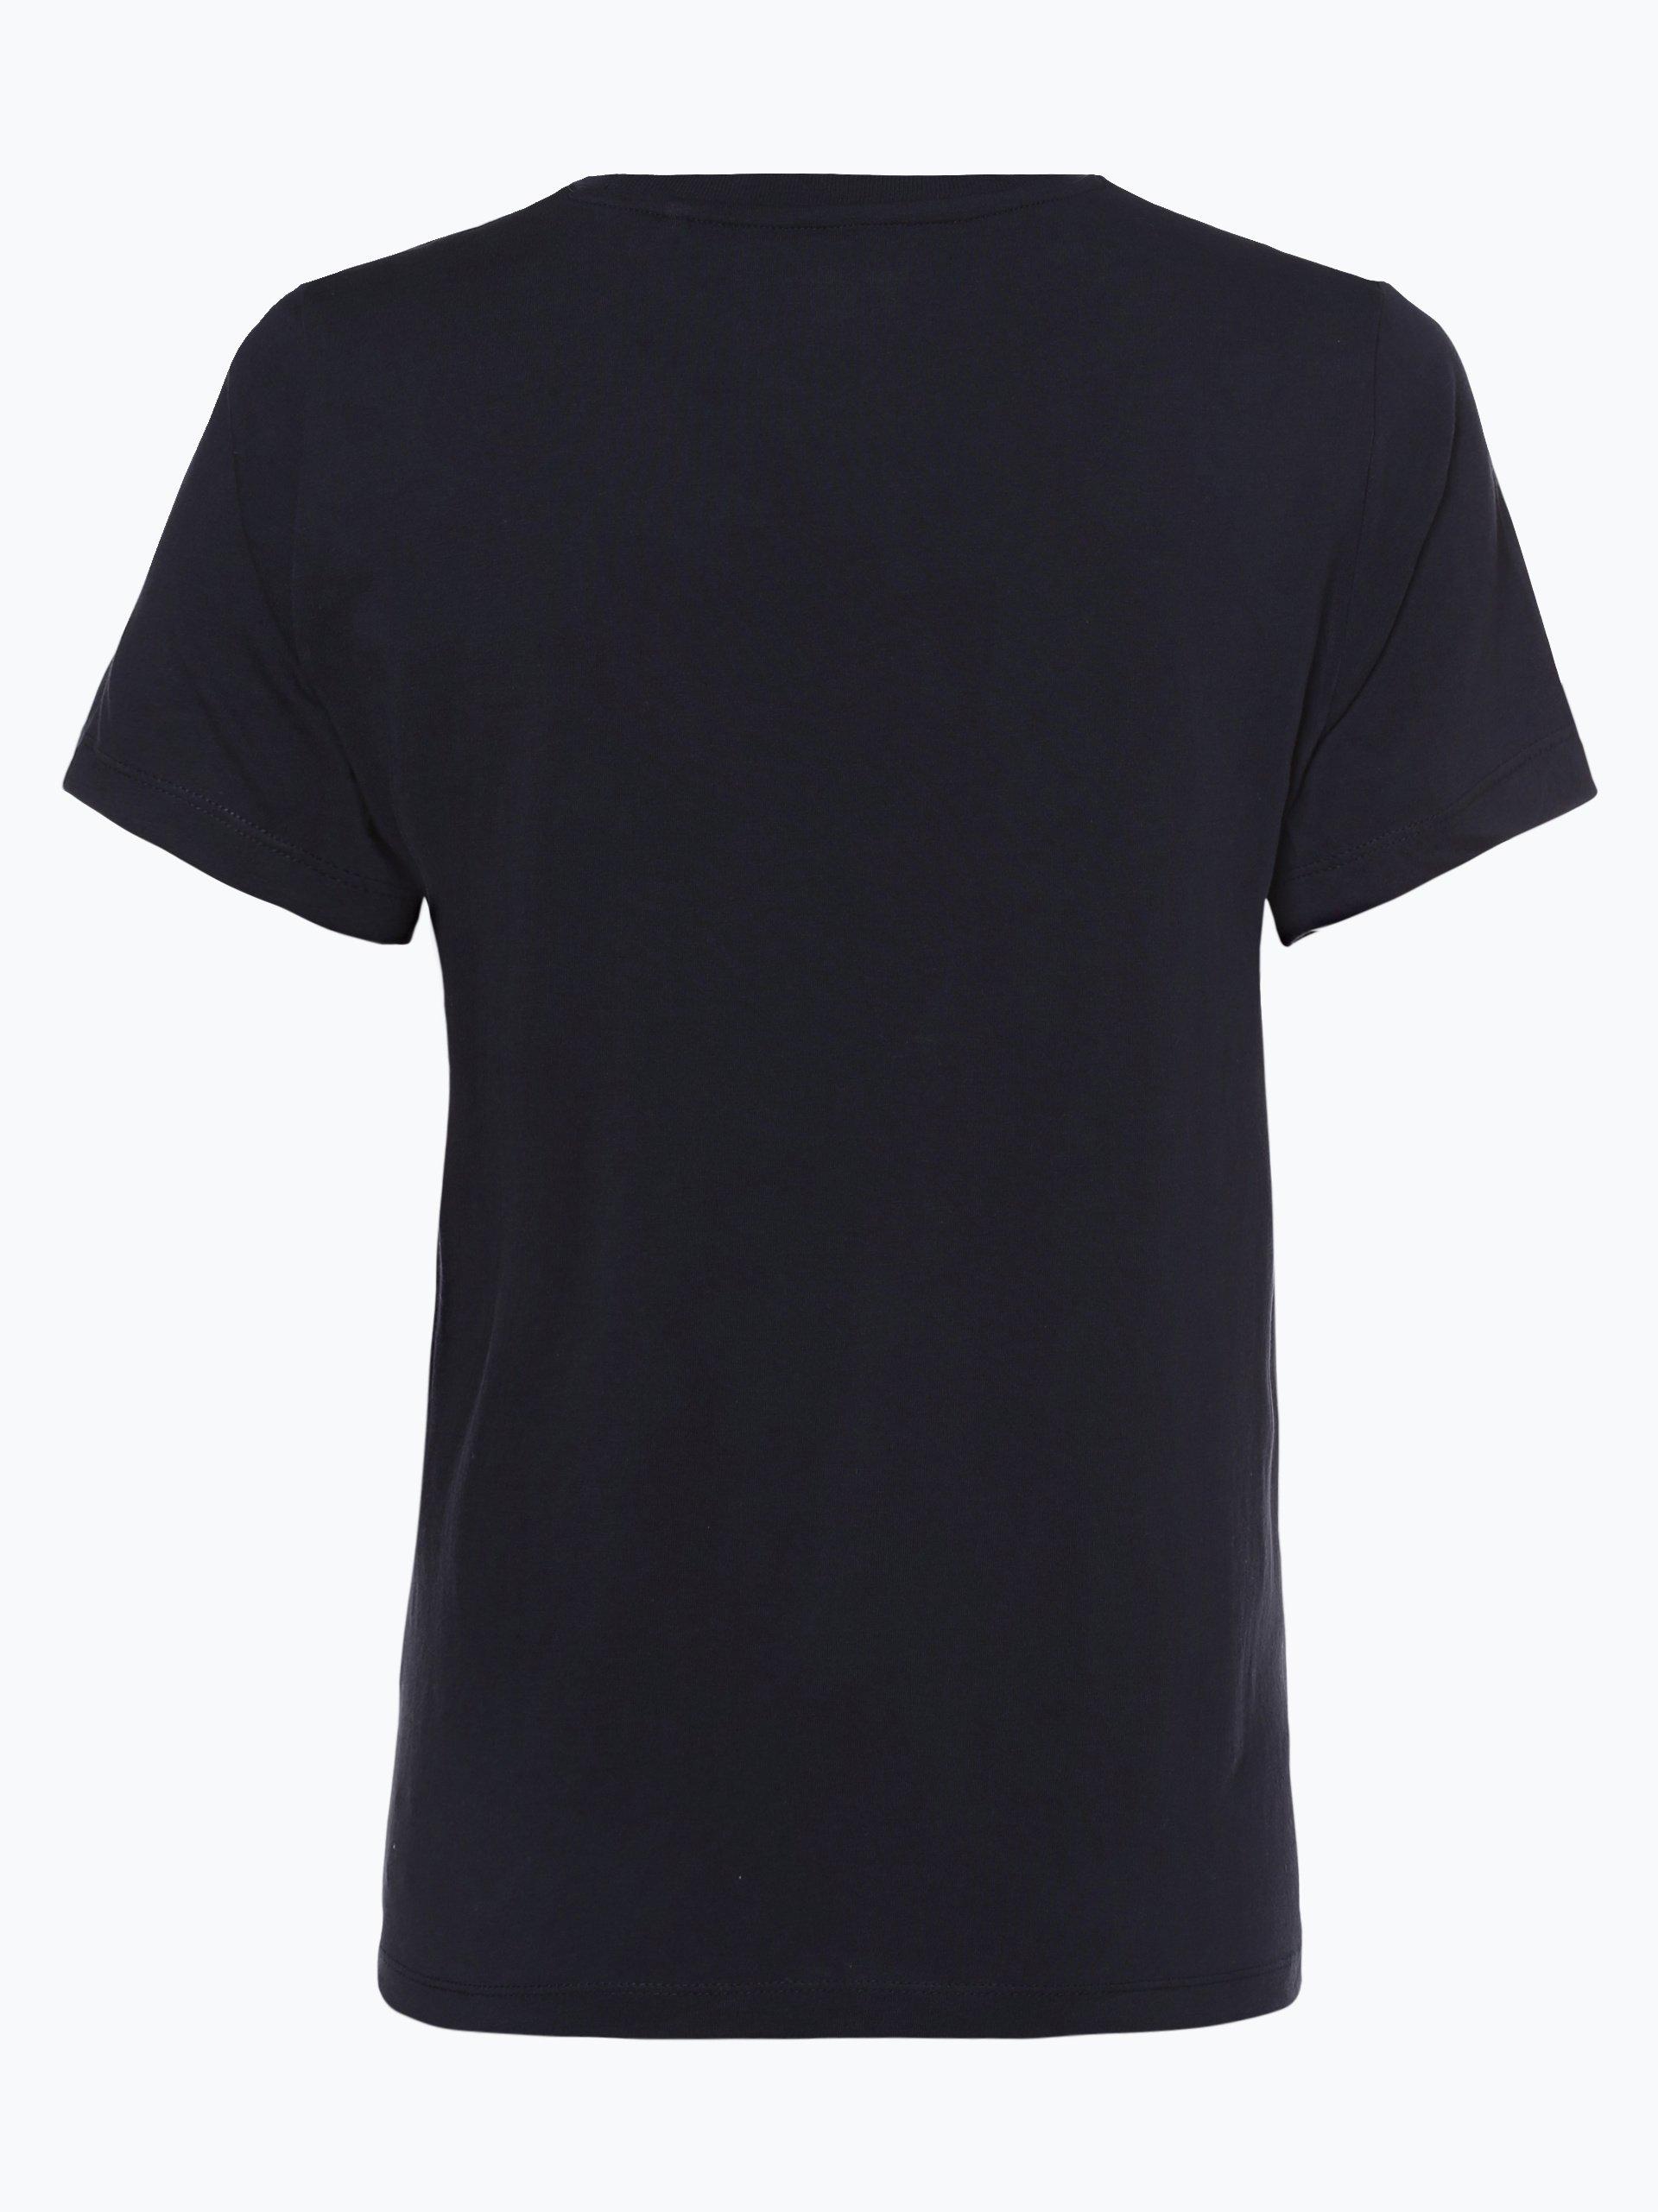 Pepe Jeans Damen T-Shirt - Marnie